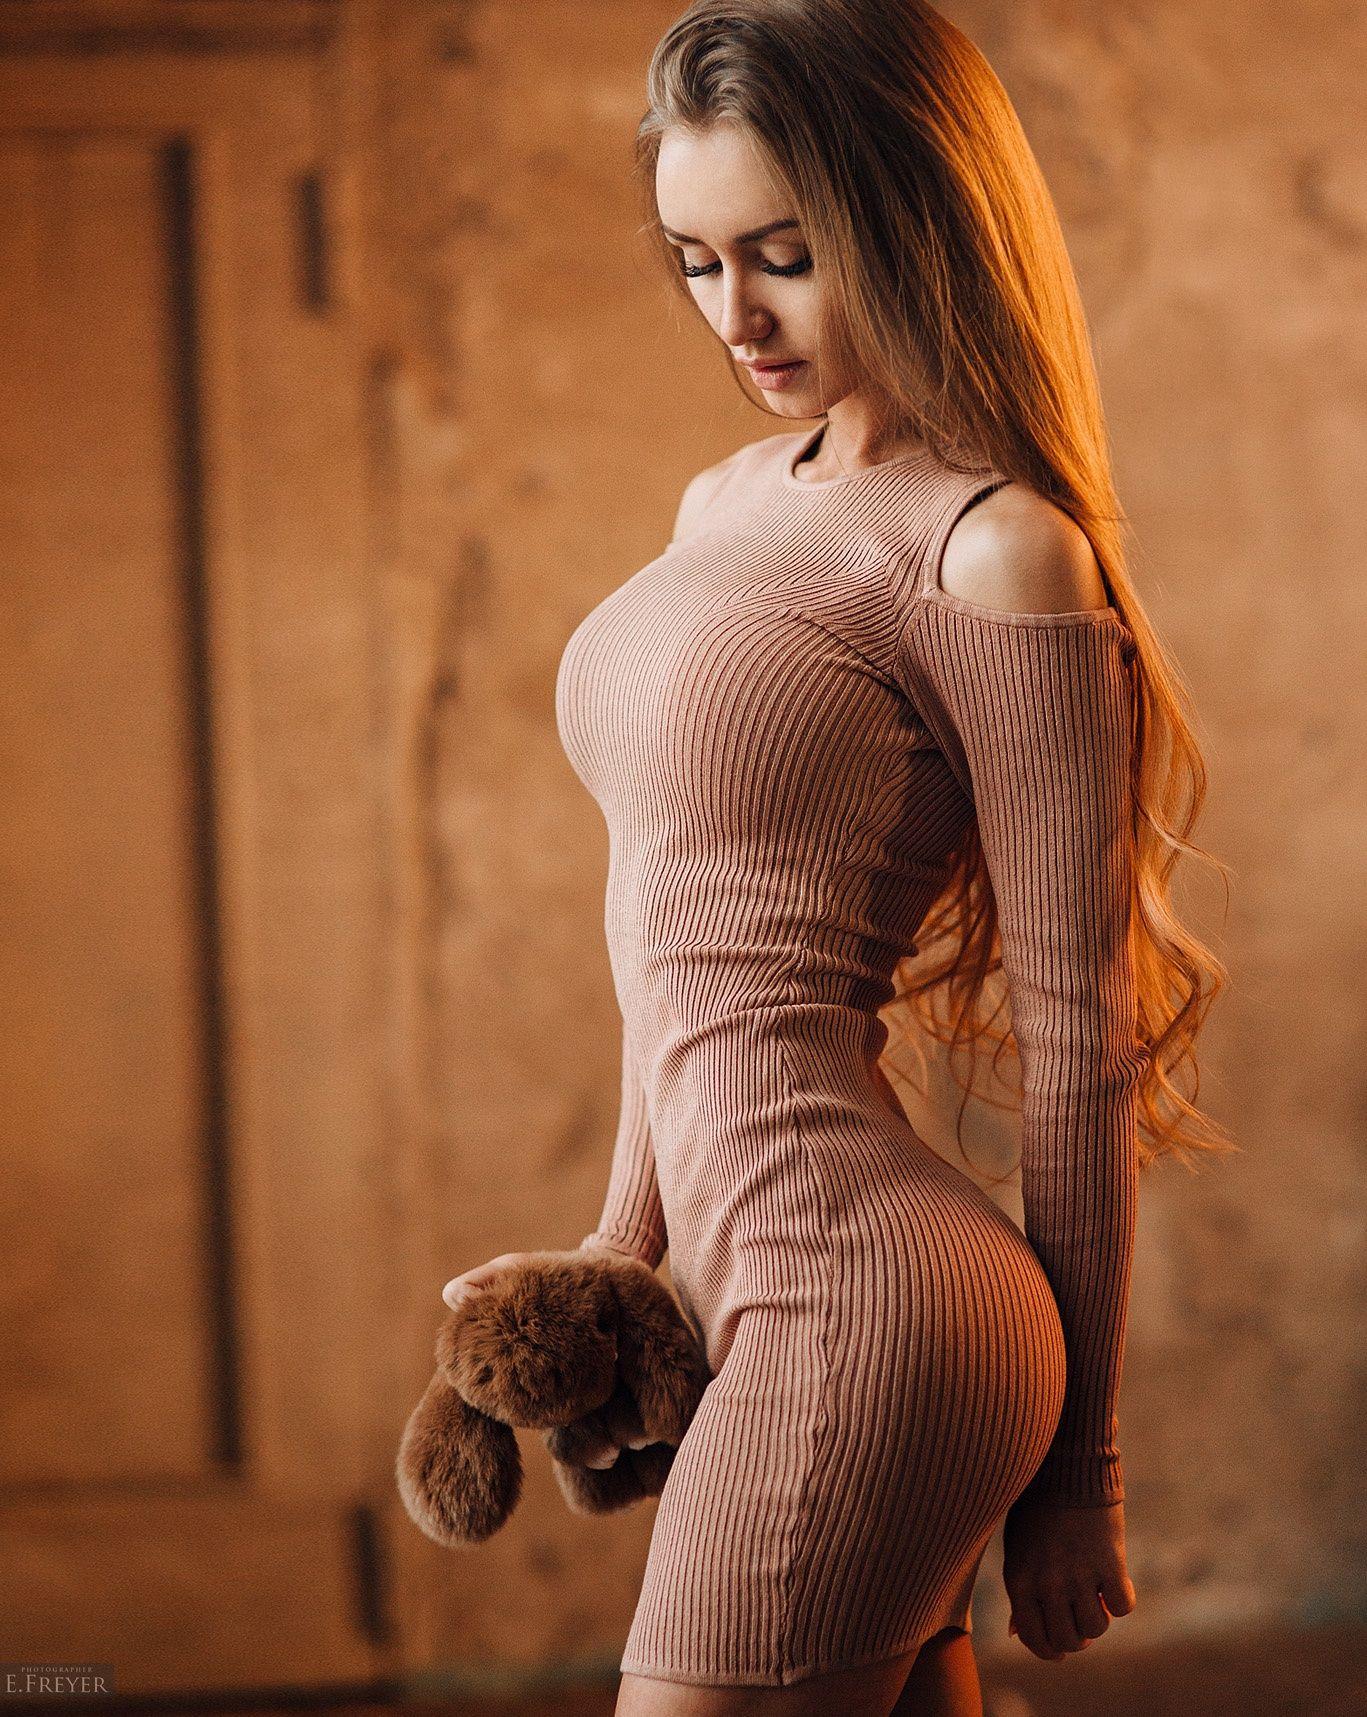 People 1367x1717 long hair dress wavy hair Valentina Grishko brunette warm light Plush Toy Evgeny Freyer women